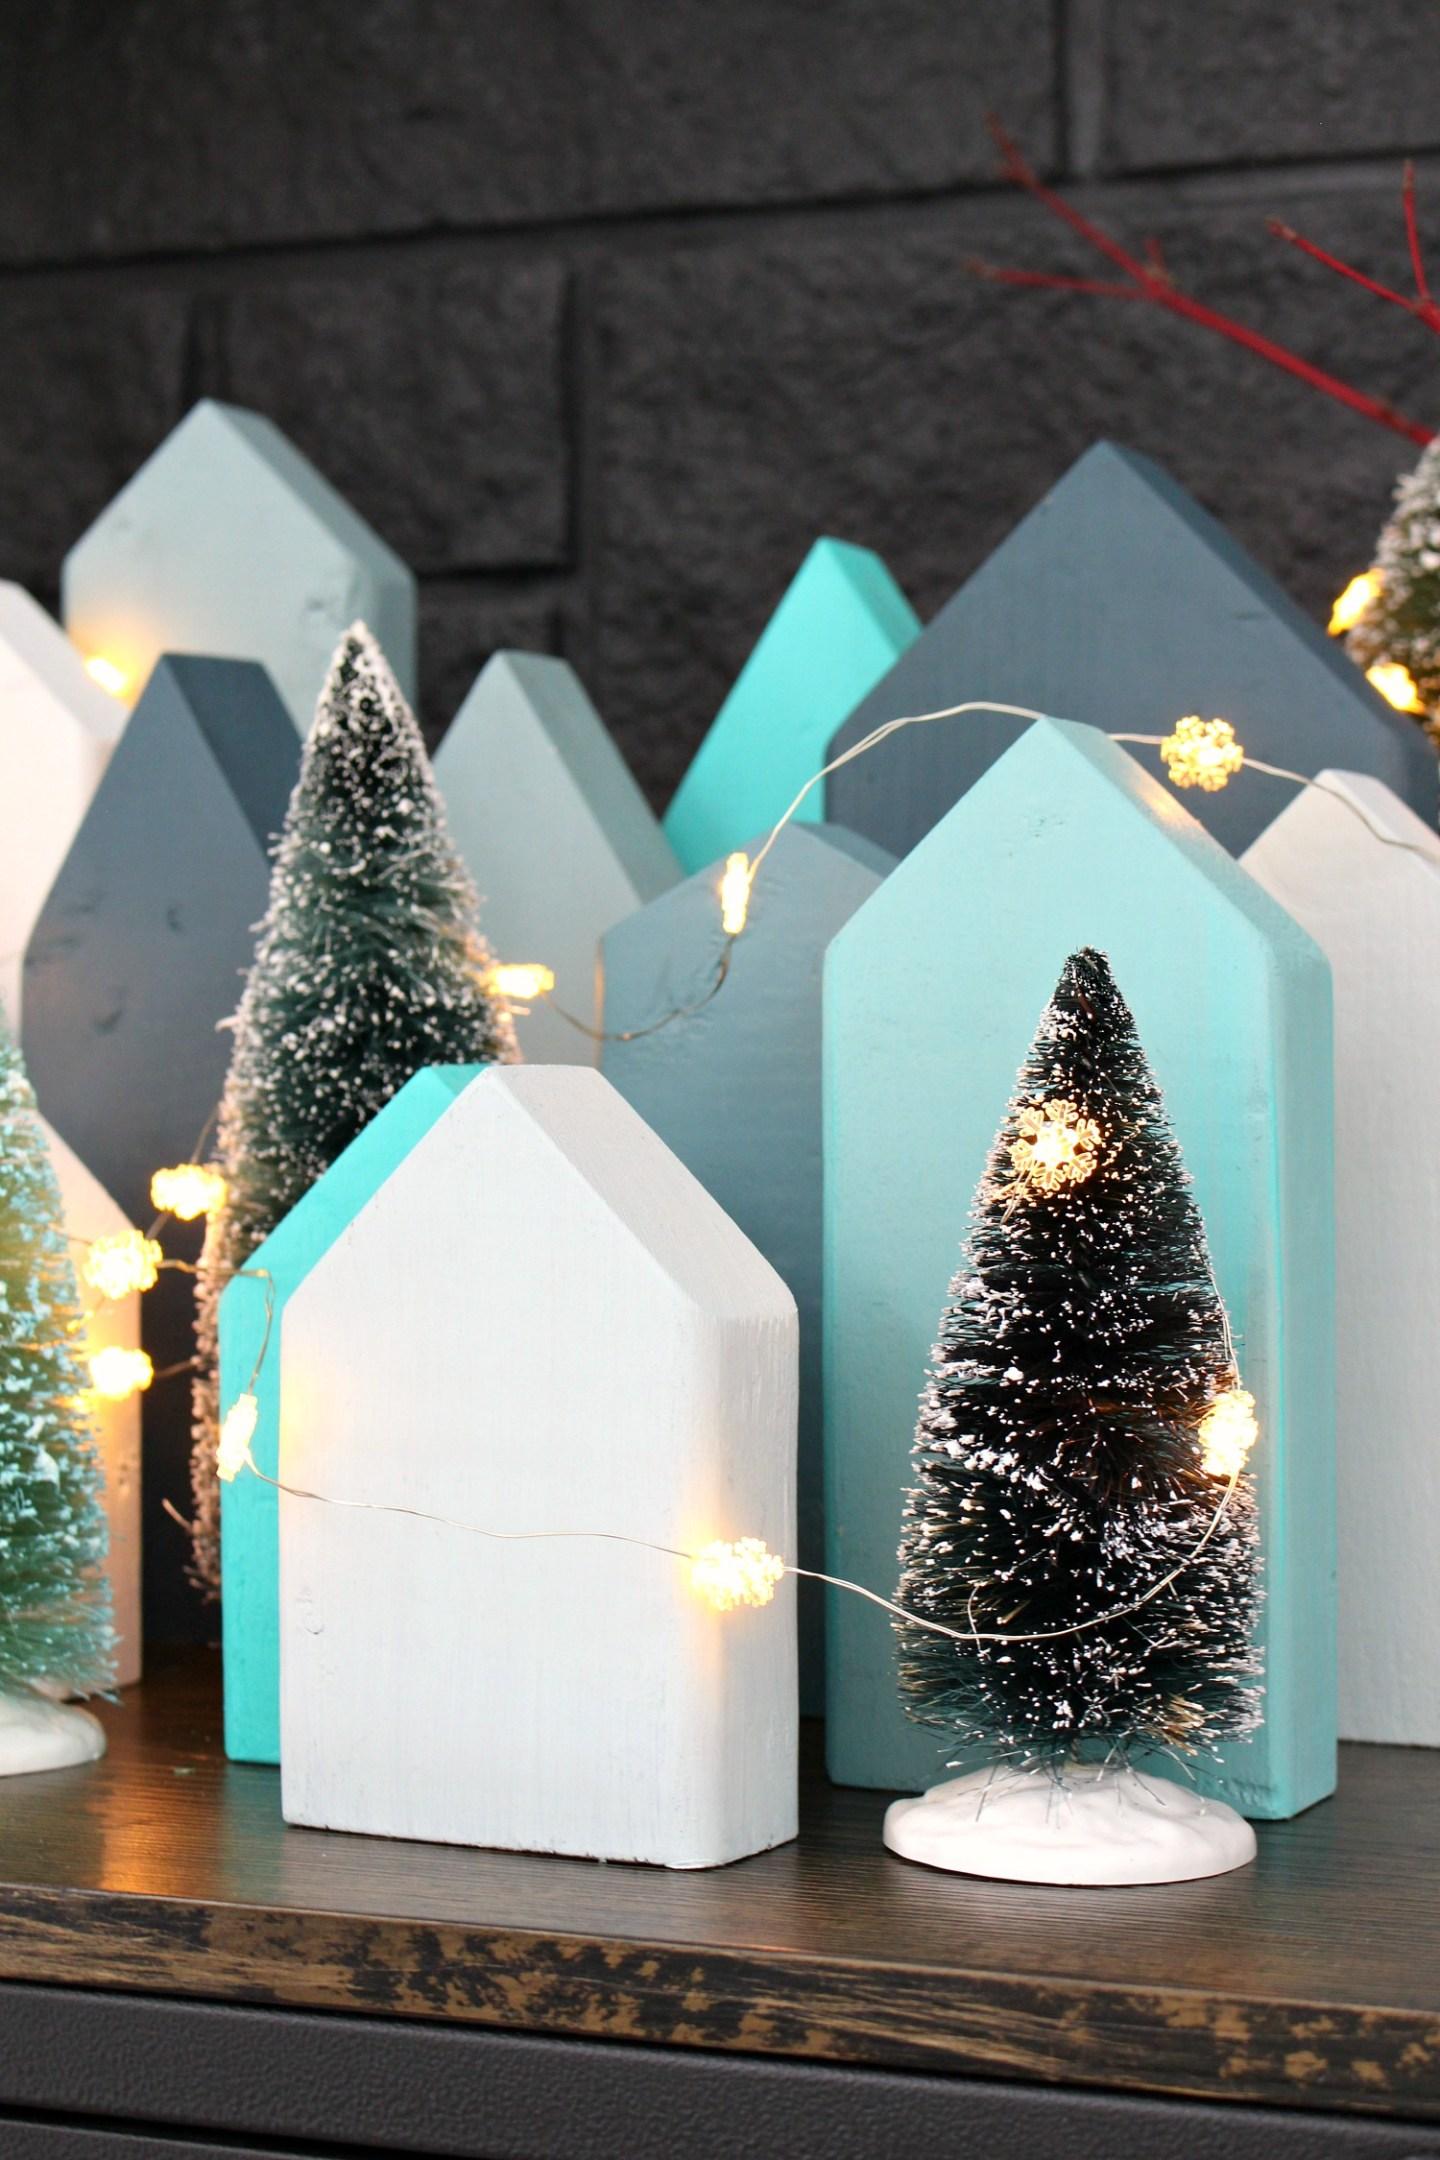 DIY Christmas Village Using Wood Scraps